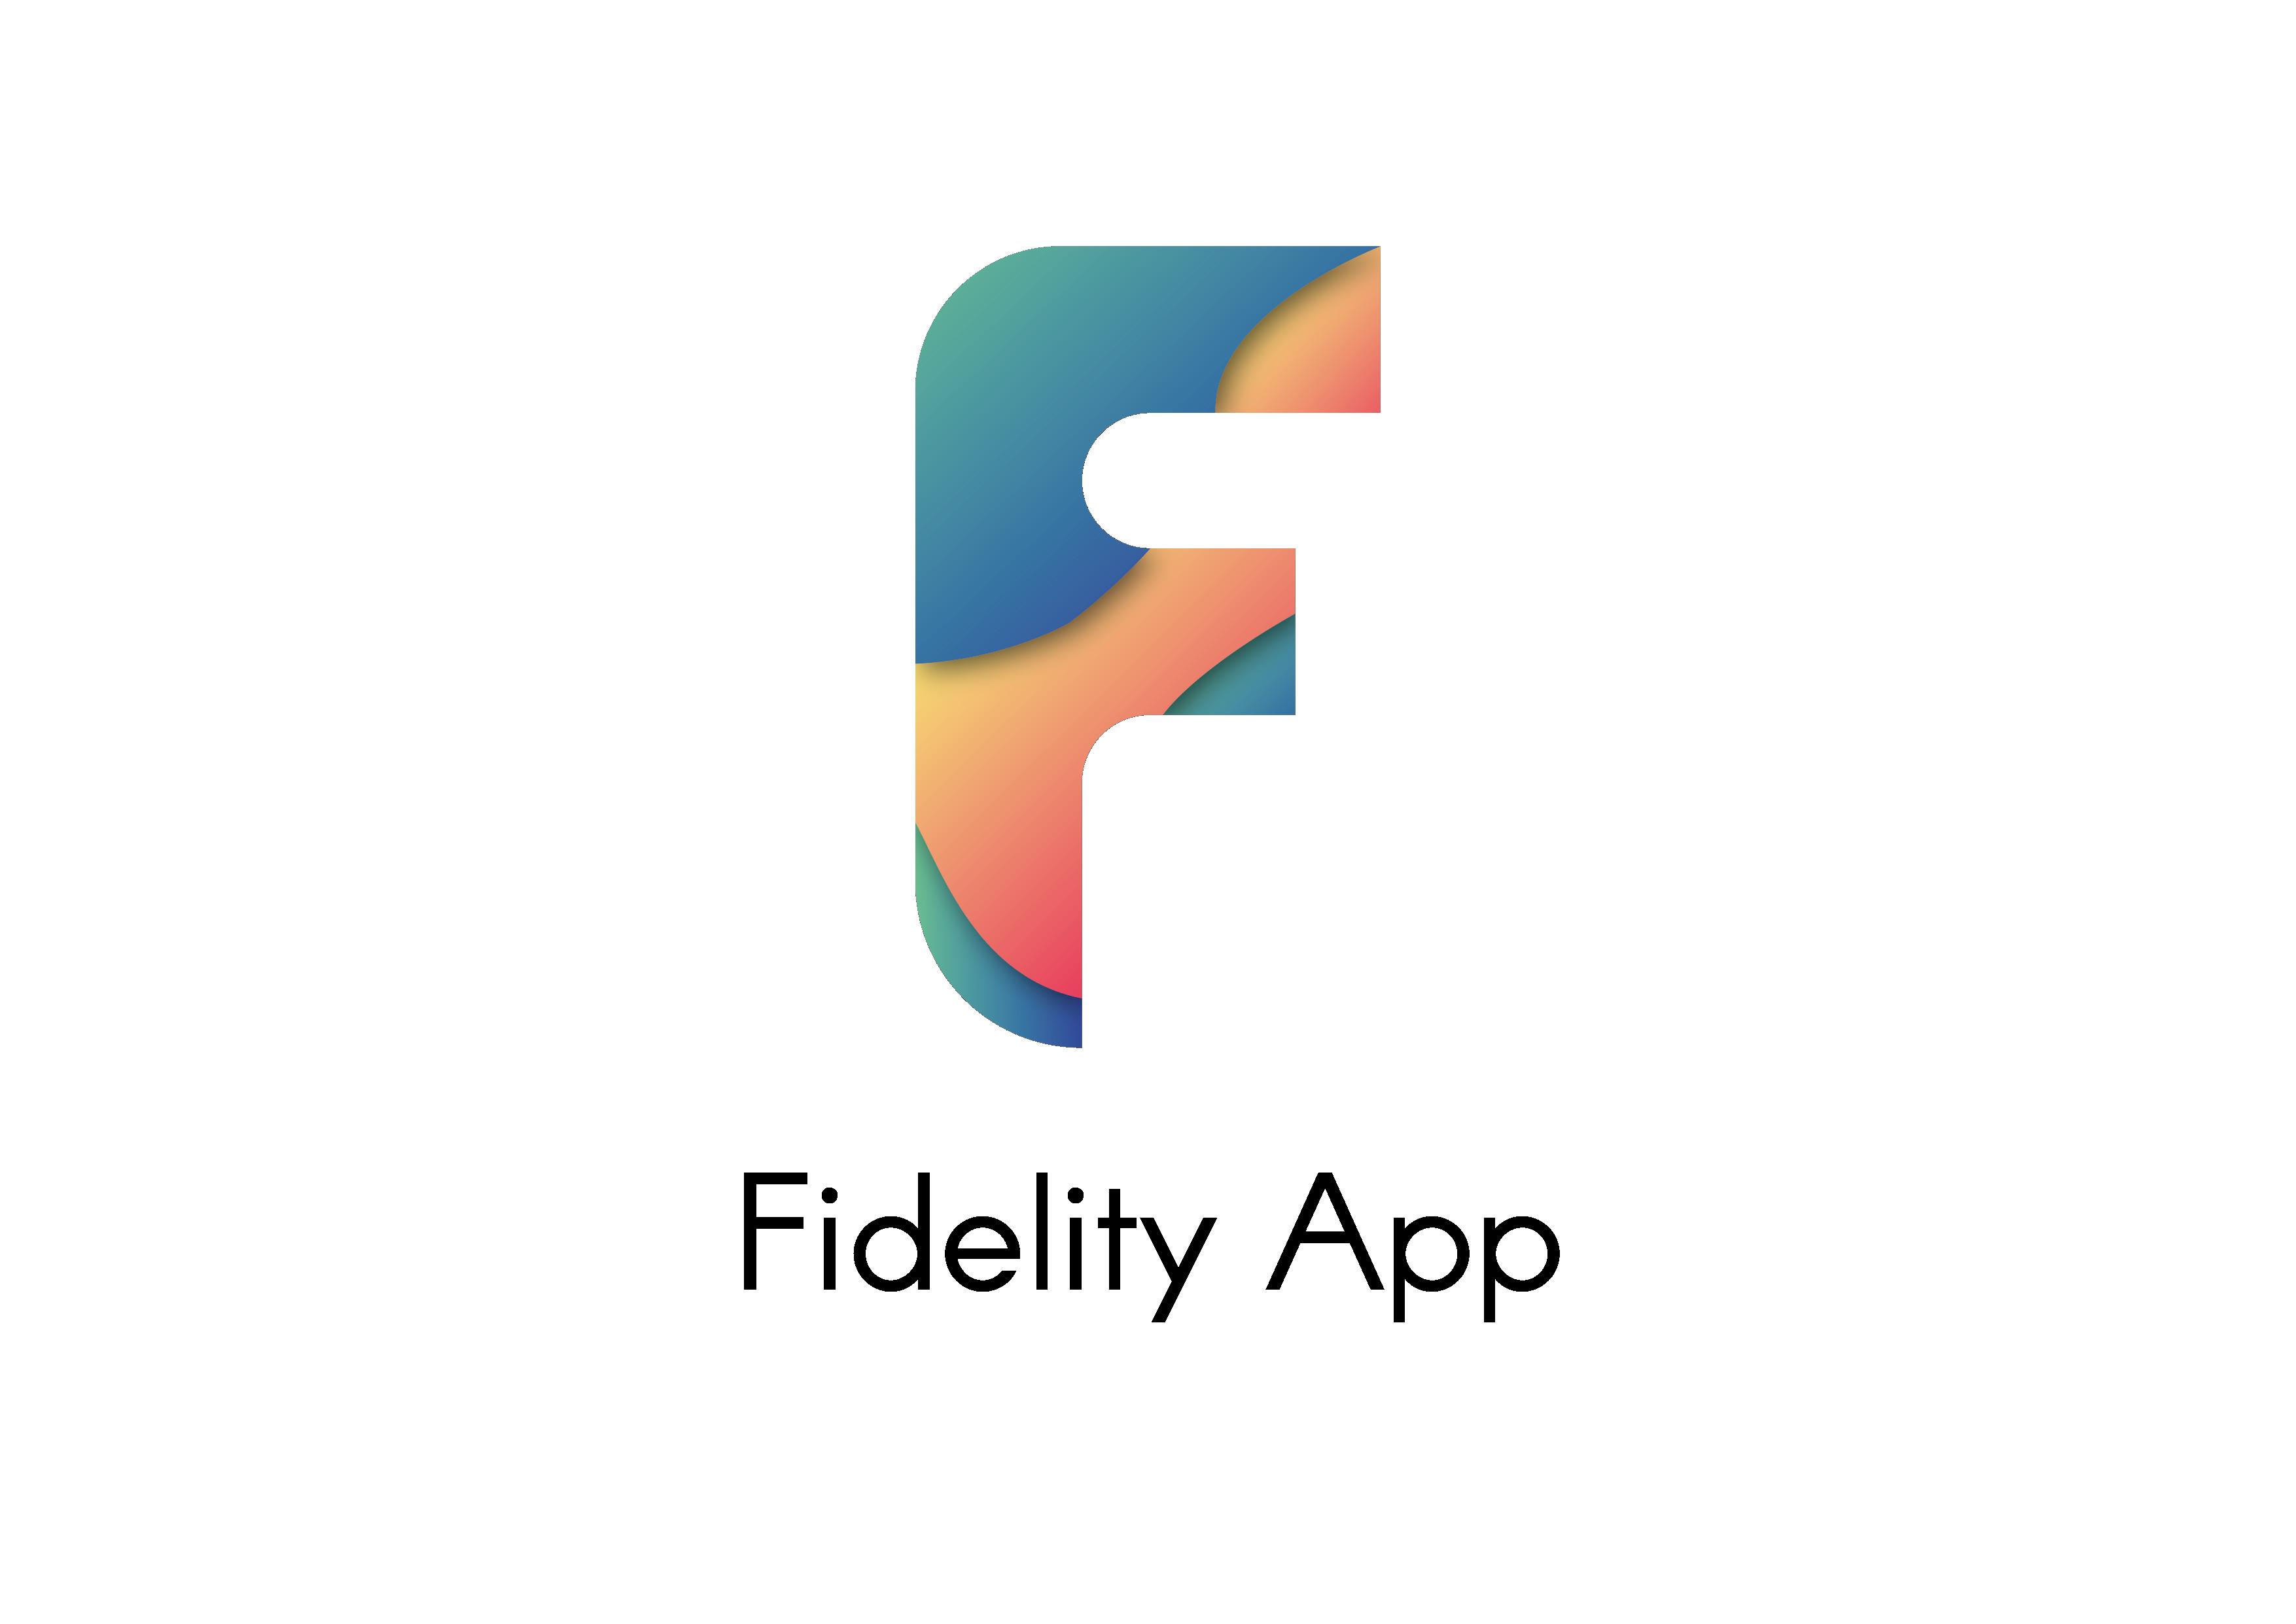 cns-01-ir000-00-Fidelity_App-Logo